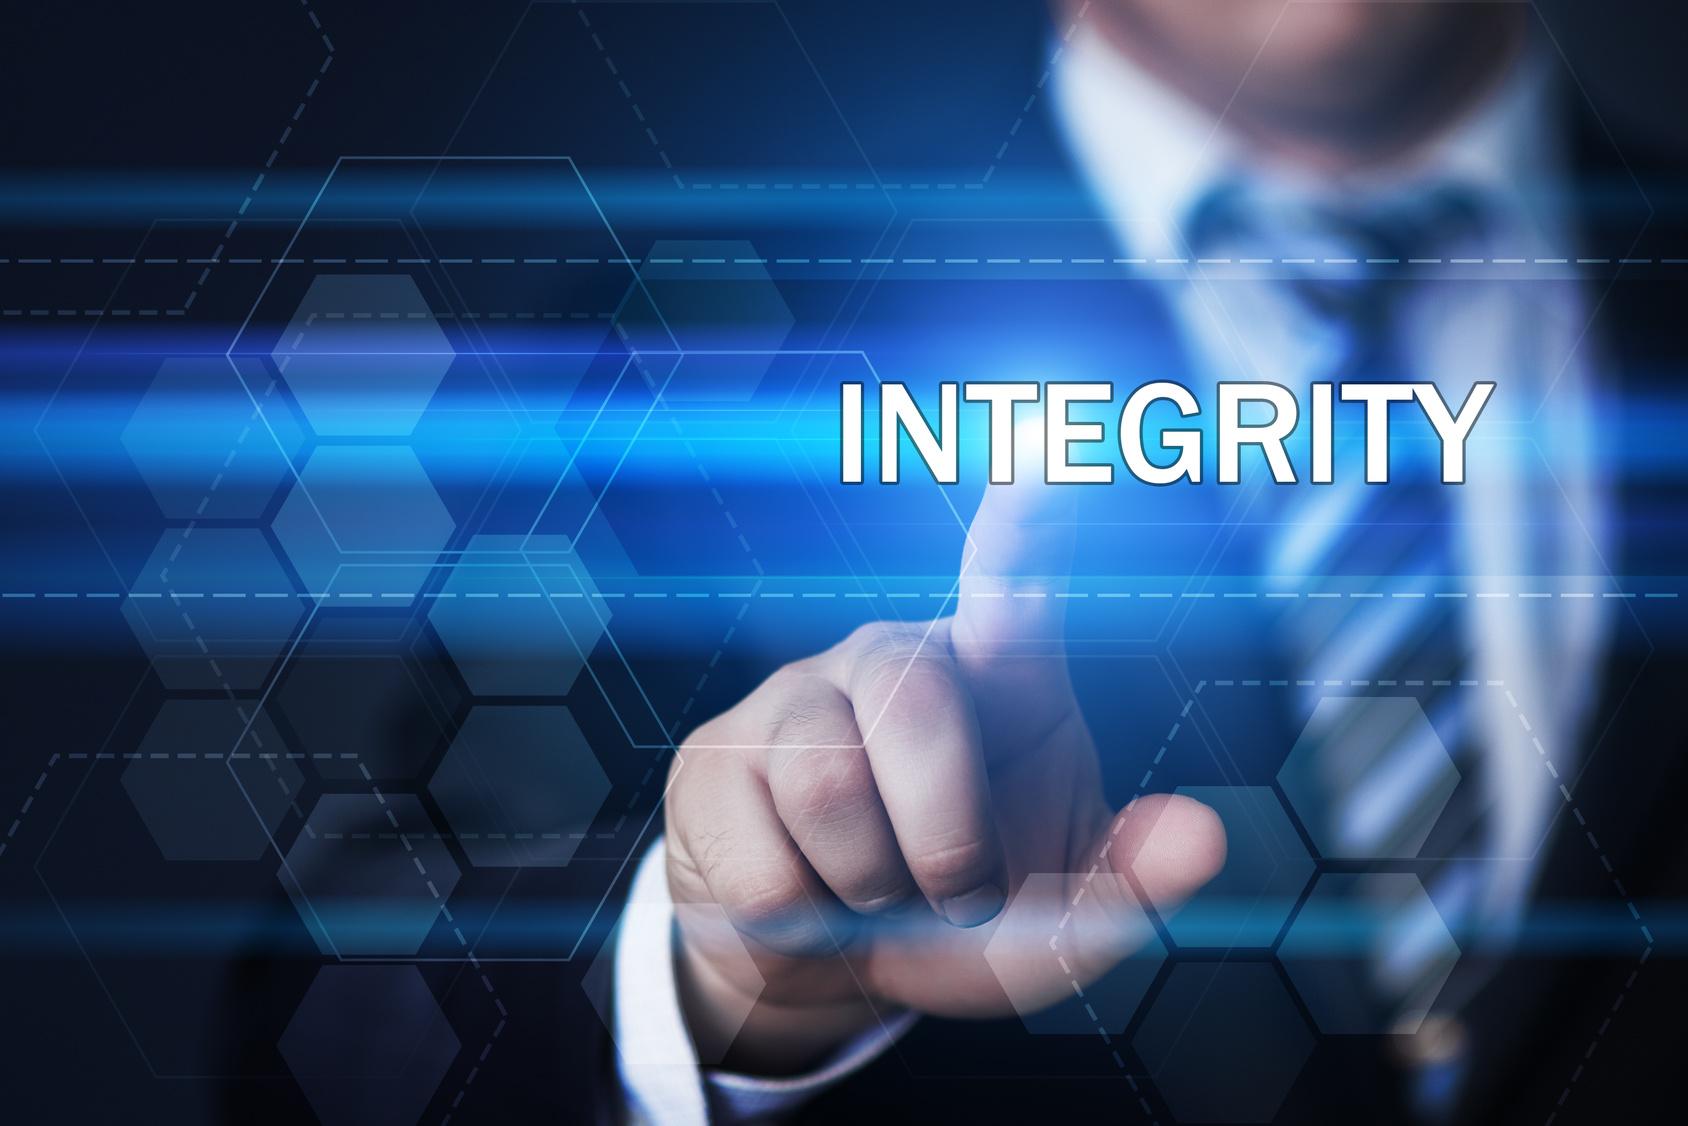 Ética e integridad para traductores jurados